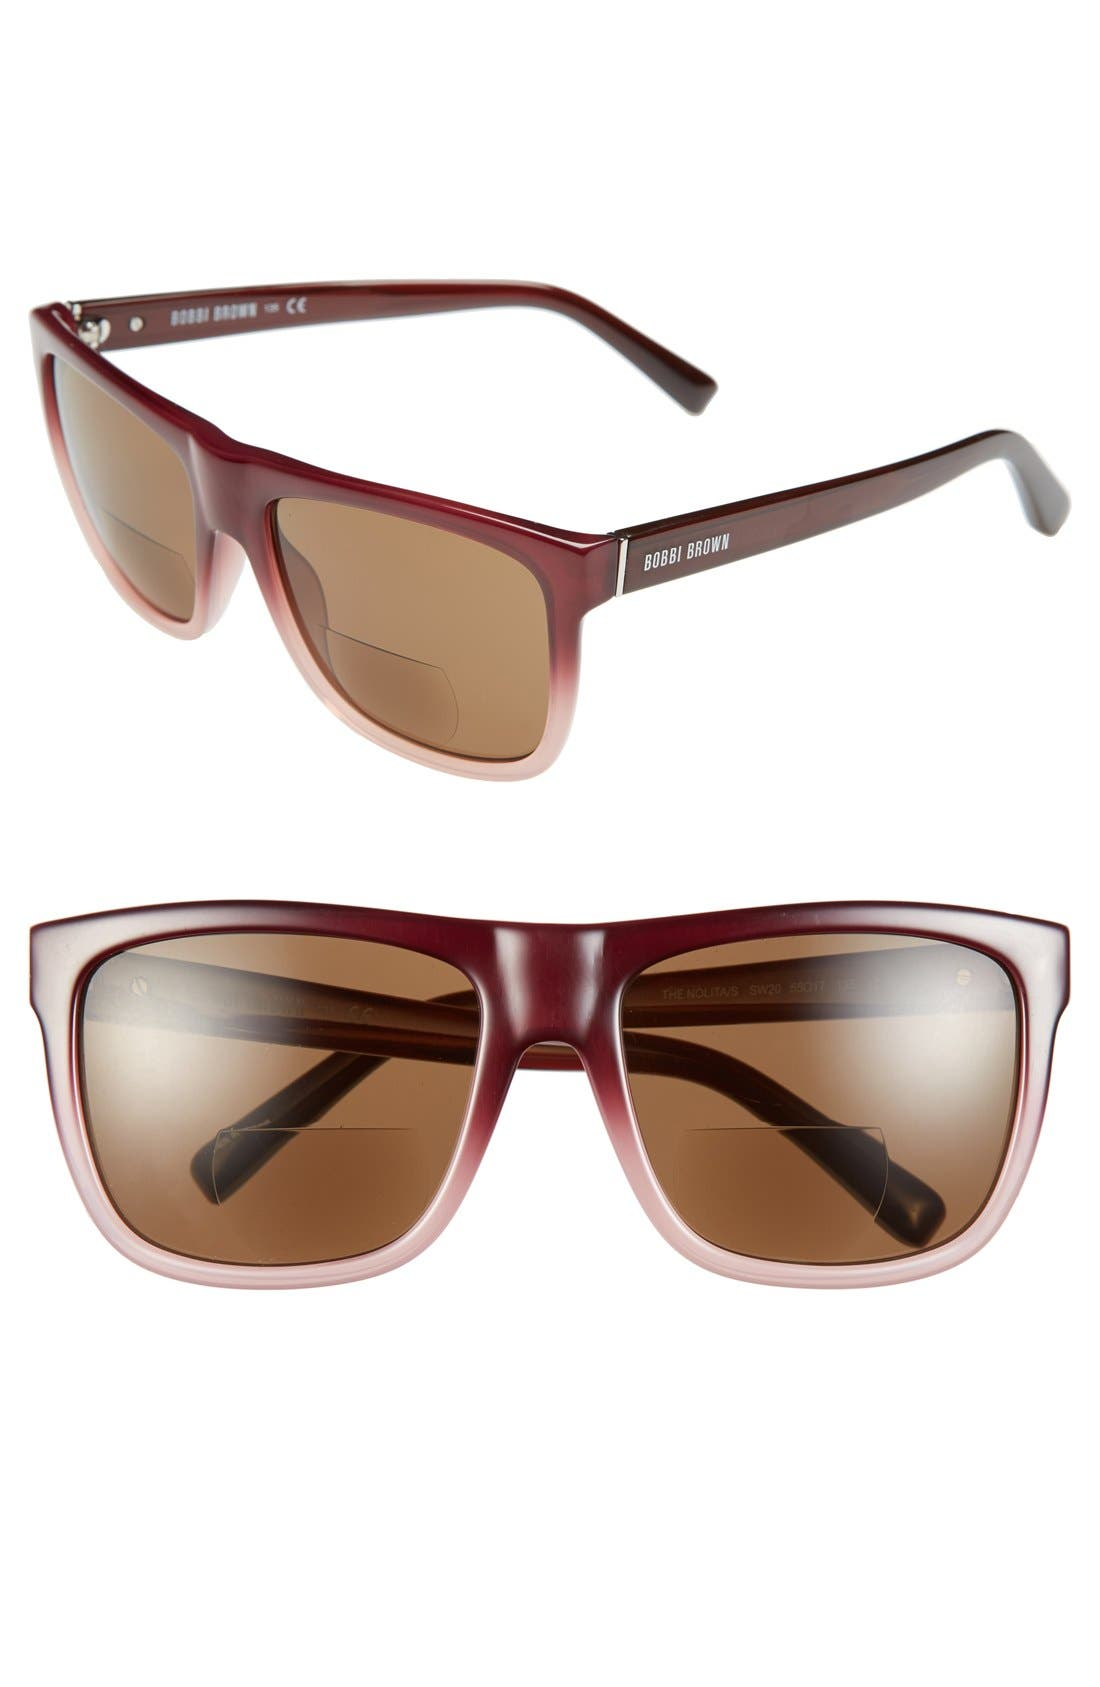 Main Image - Bobbi Brown 'The Nolita' 55mm Reading Sunglasses (2 for $88)